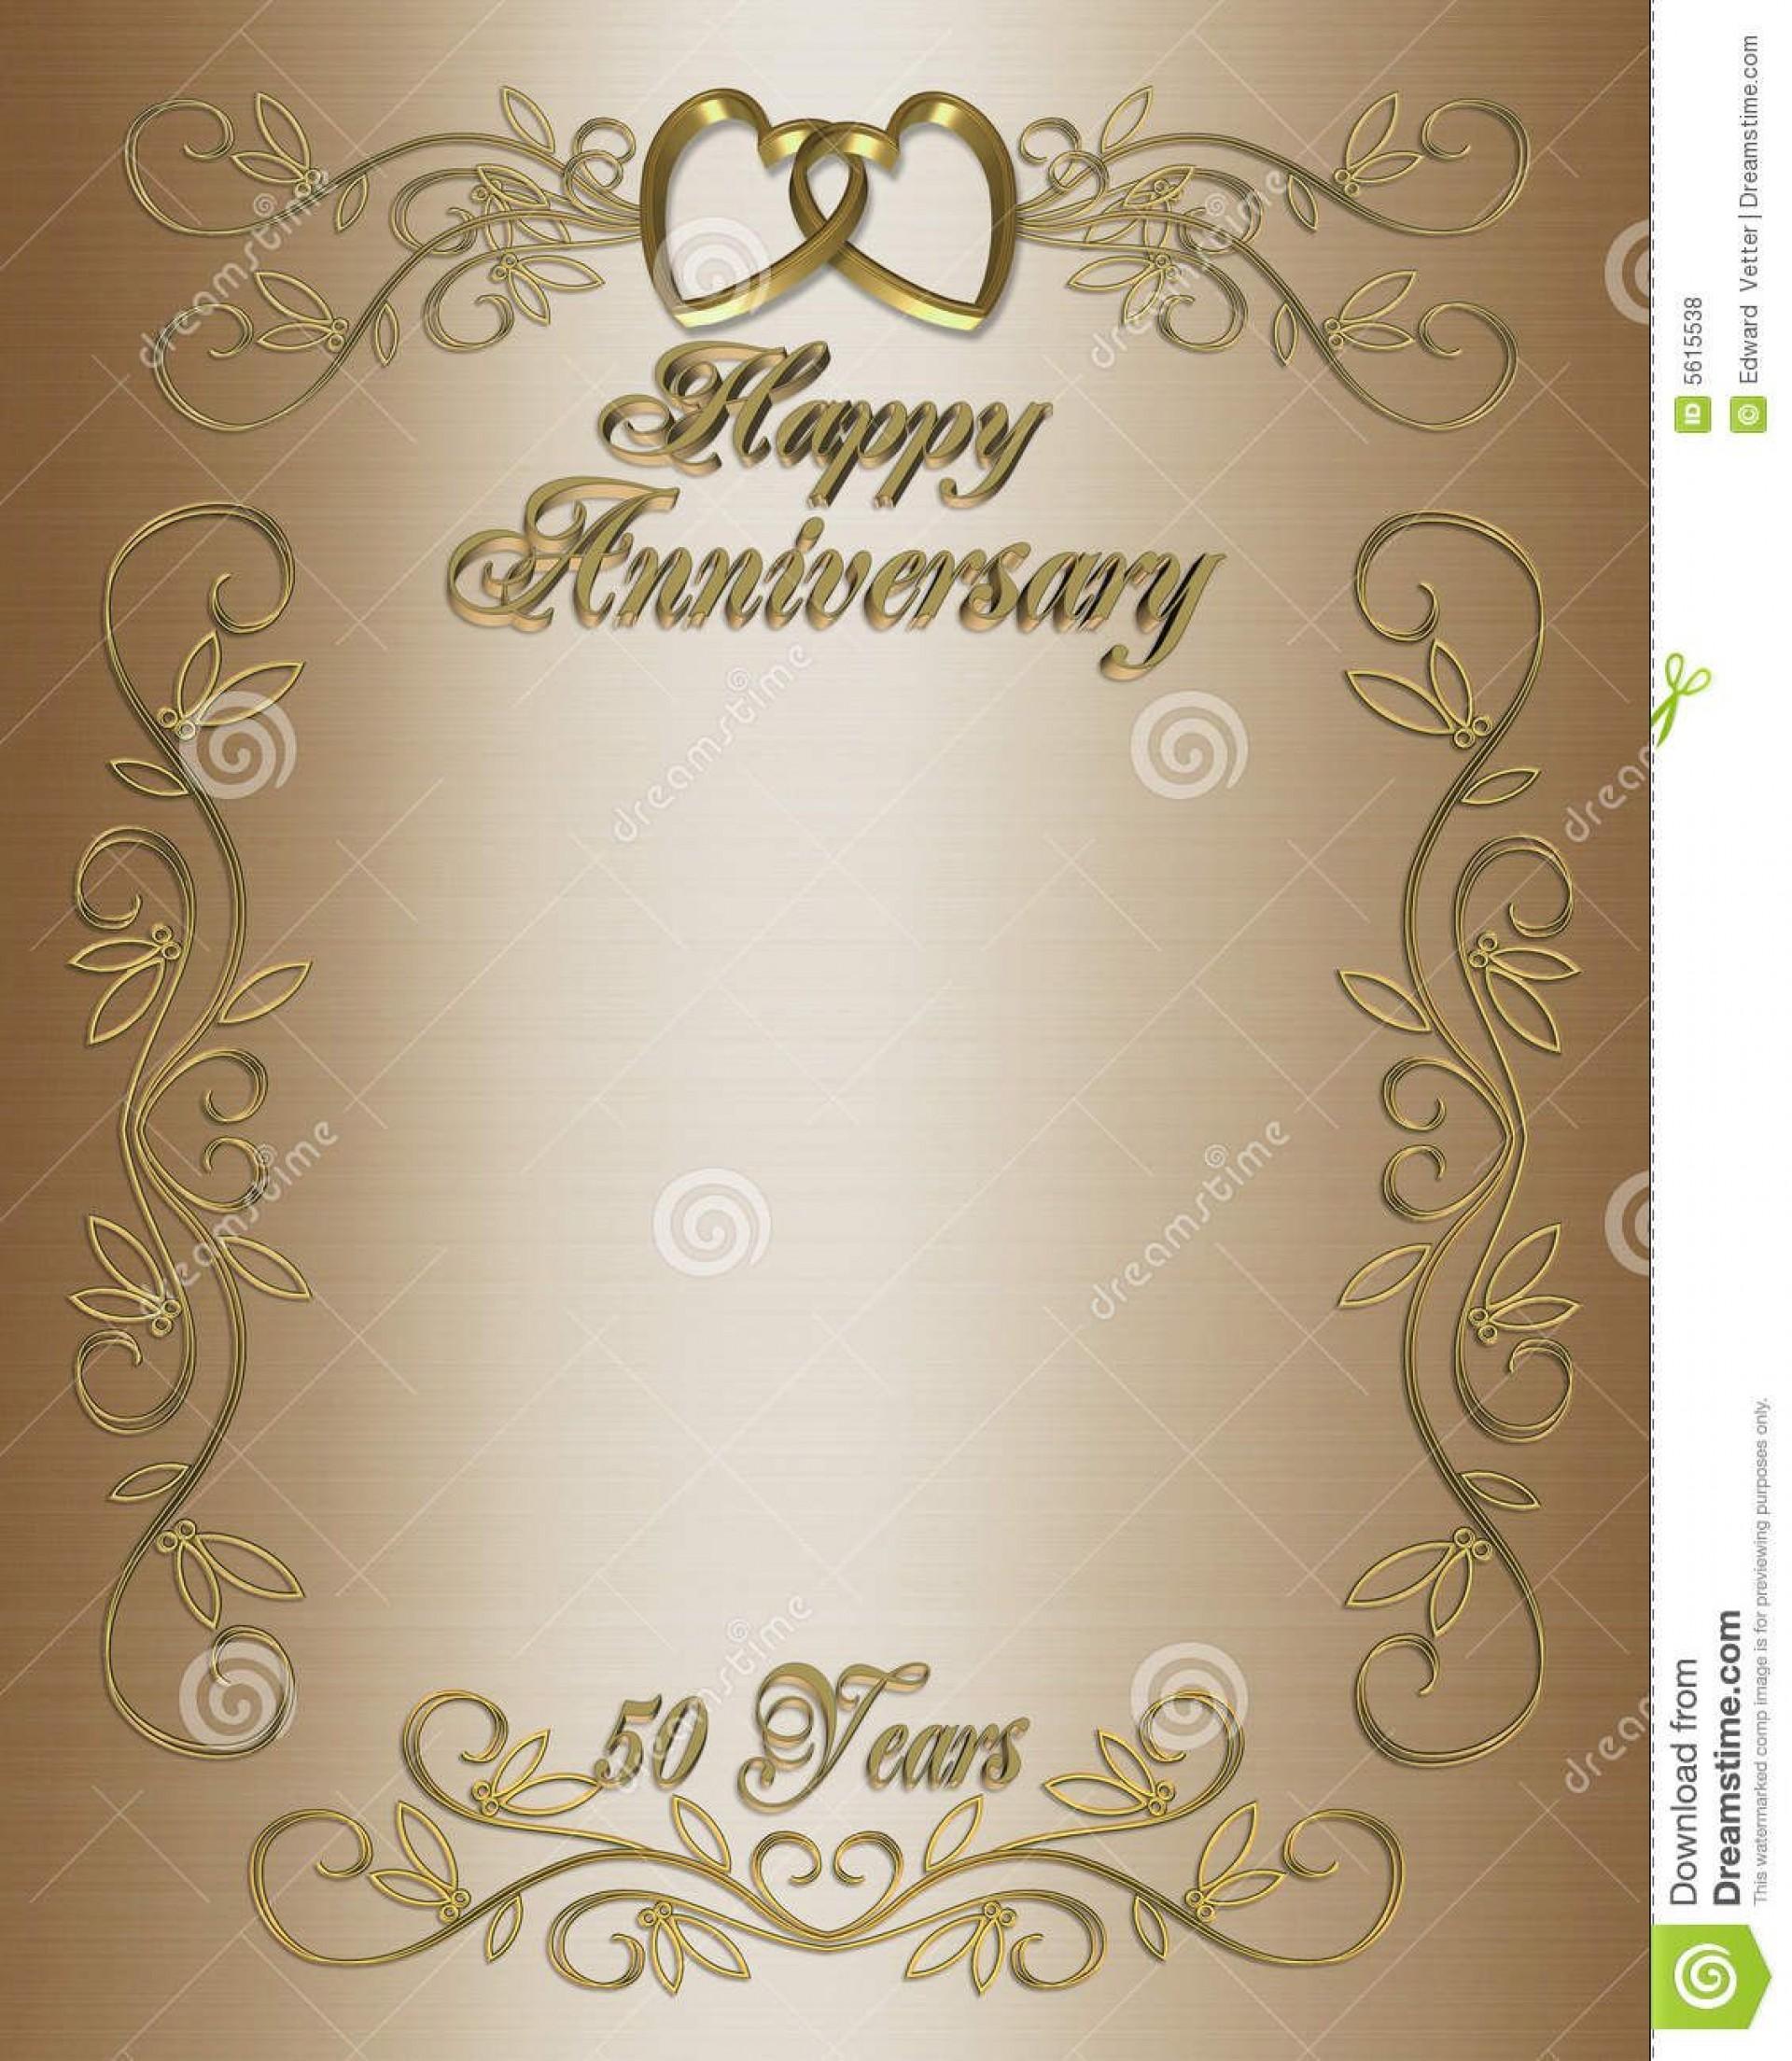 001 Wondrou 50th Anniversary Invitation Design High Def  Designs Wedding Template Microsoft Word Surprise Party Wording Card Idea1920